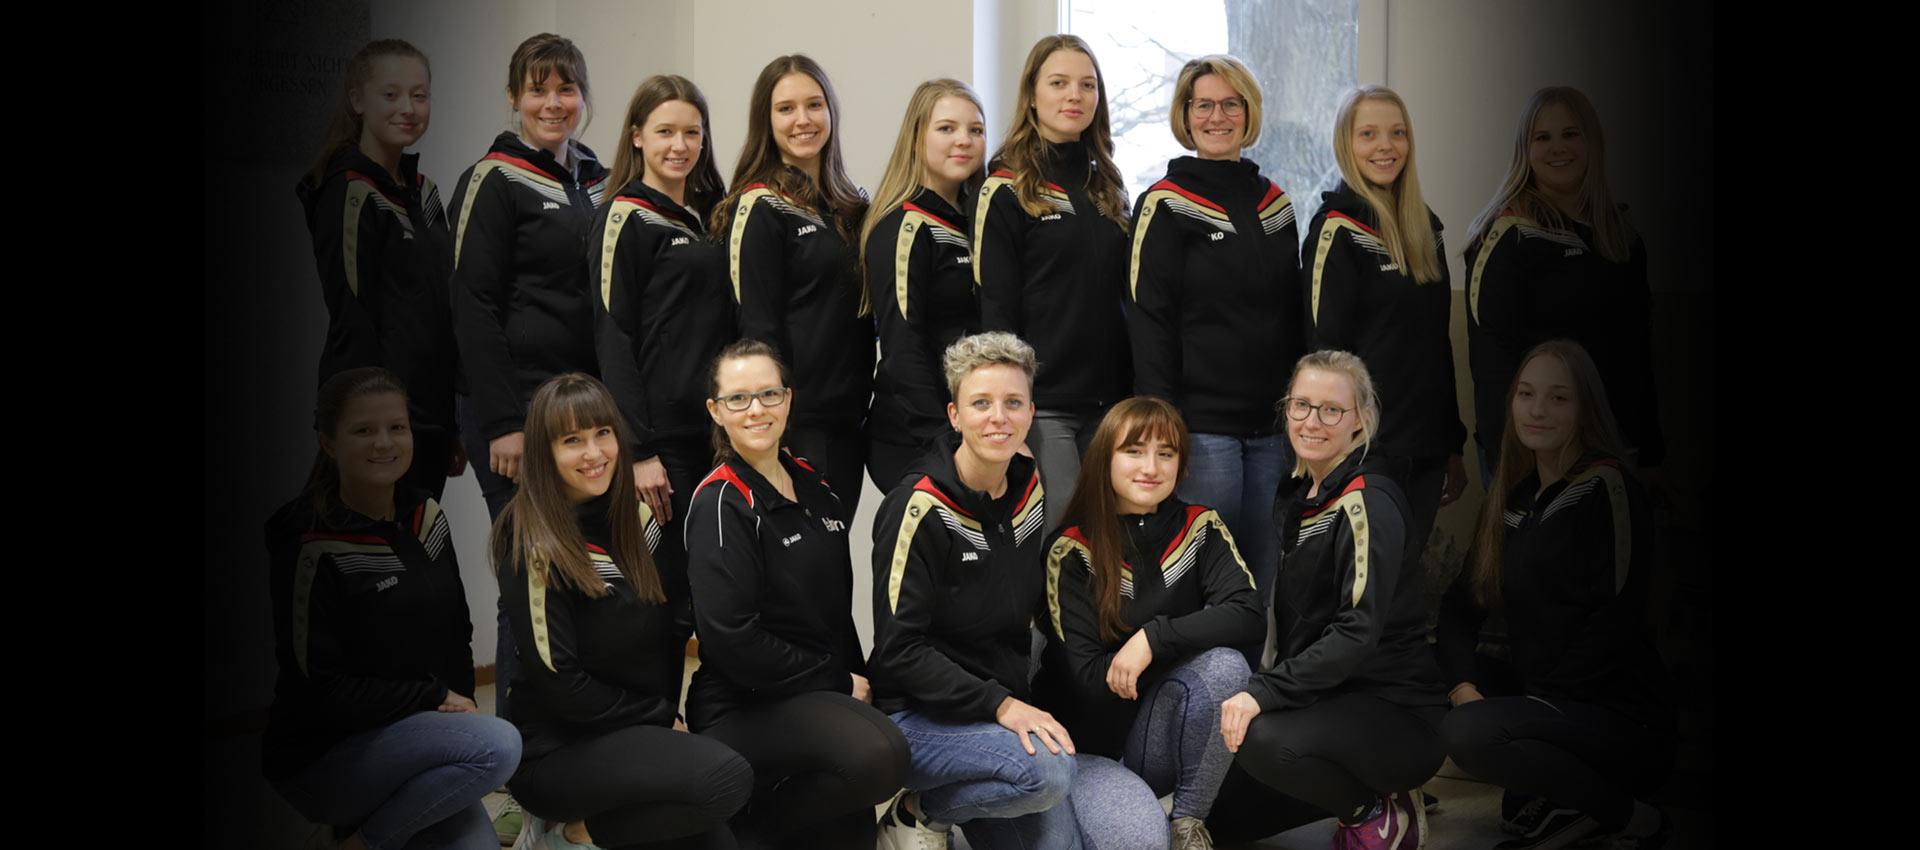 Das Trainerteam der Faschingsgilde